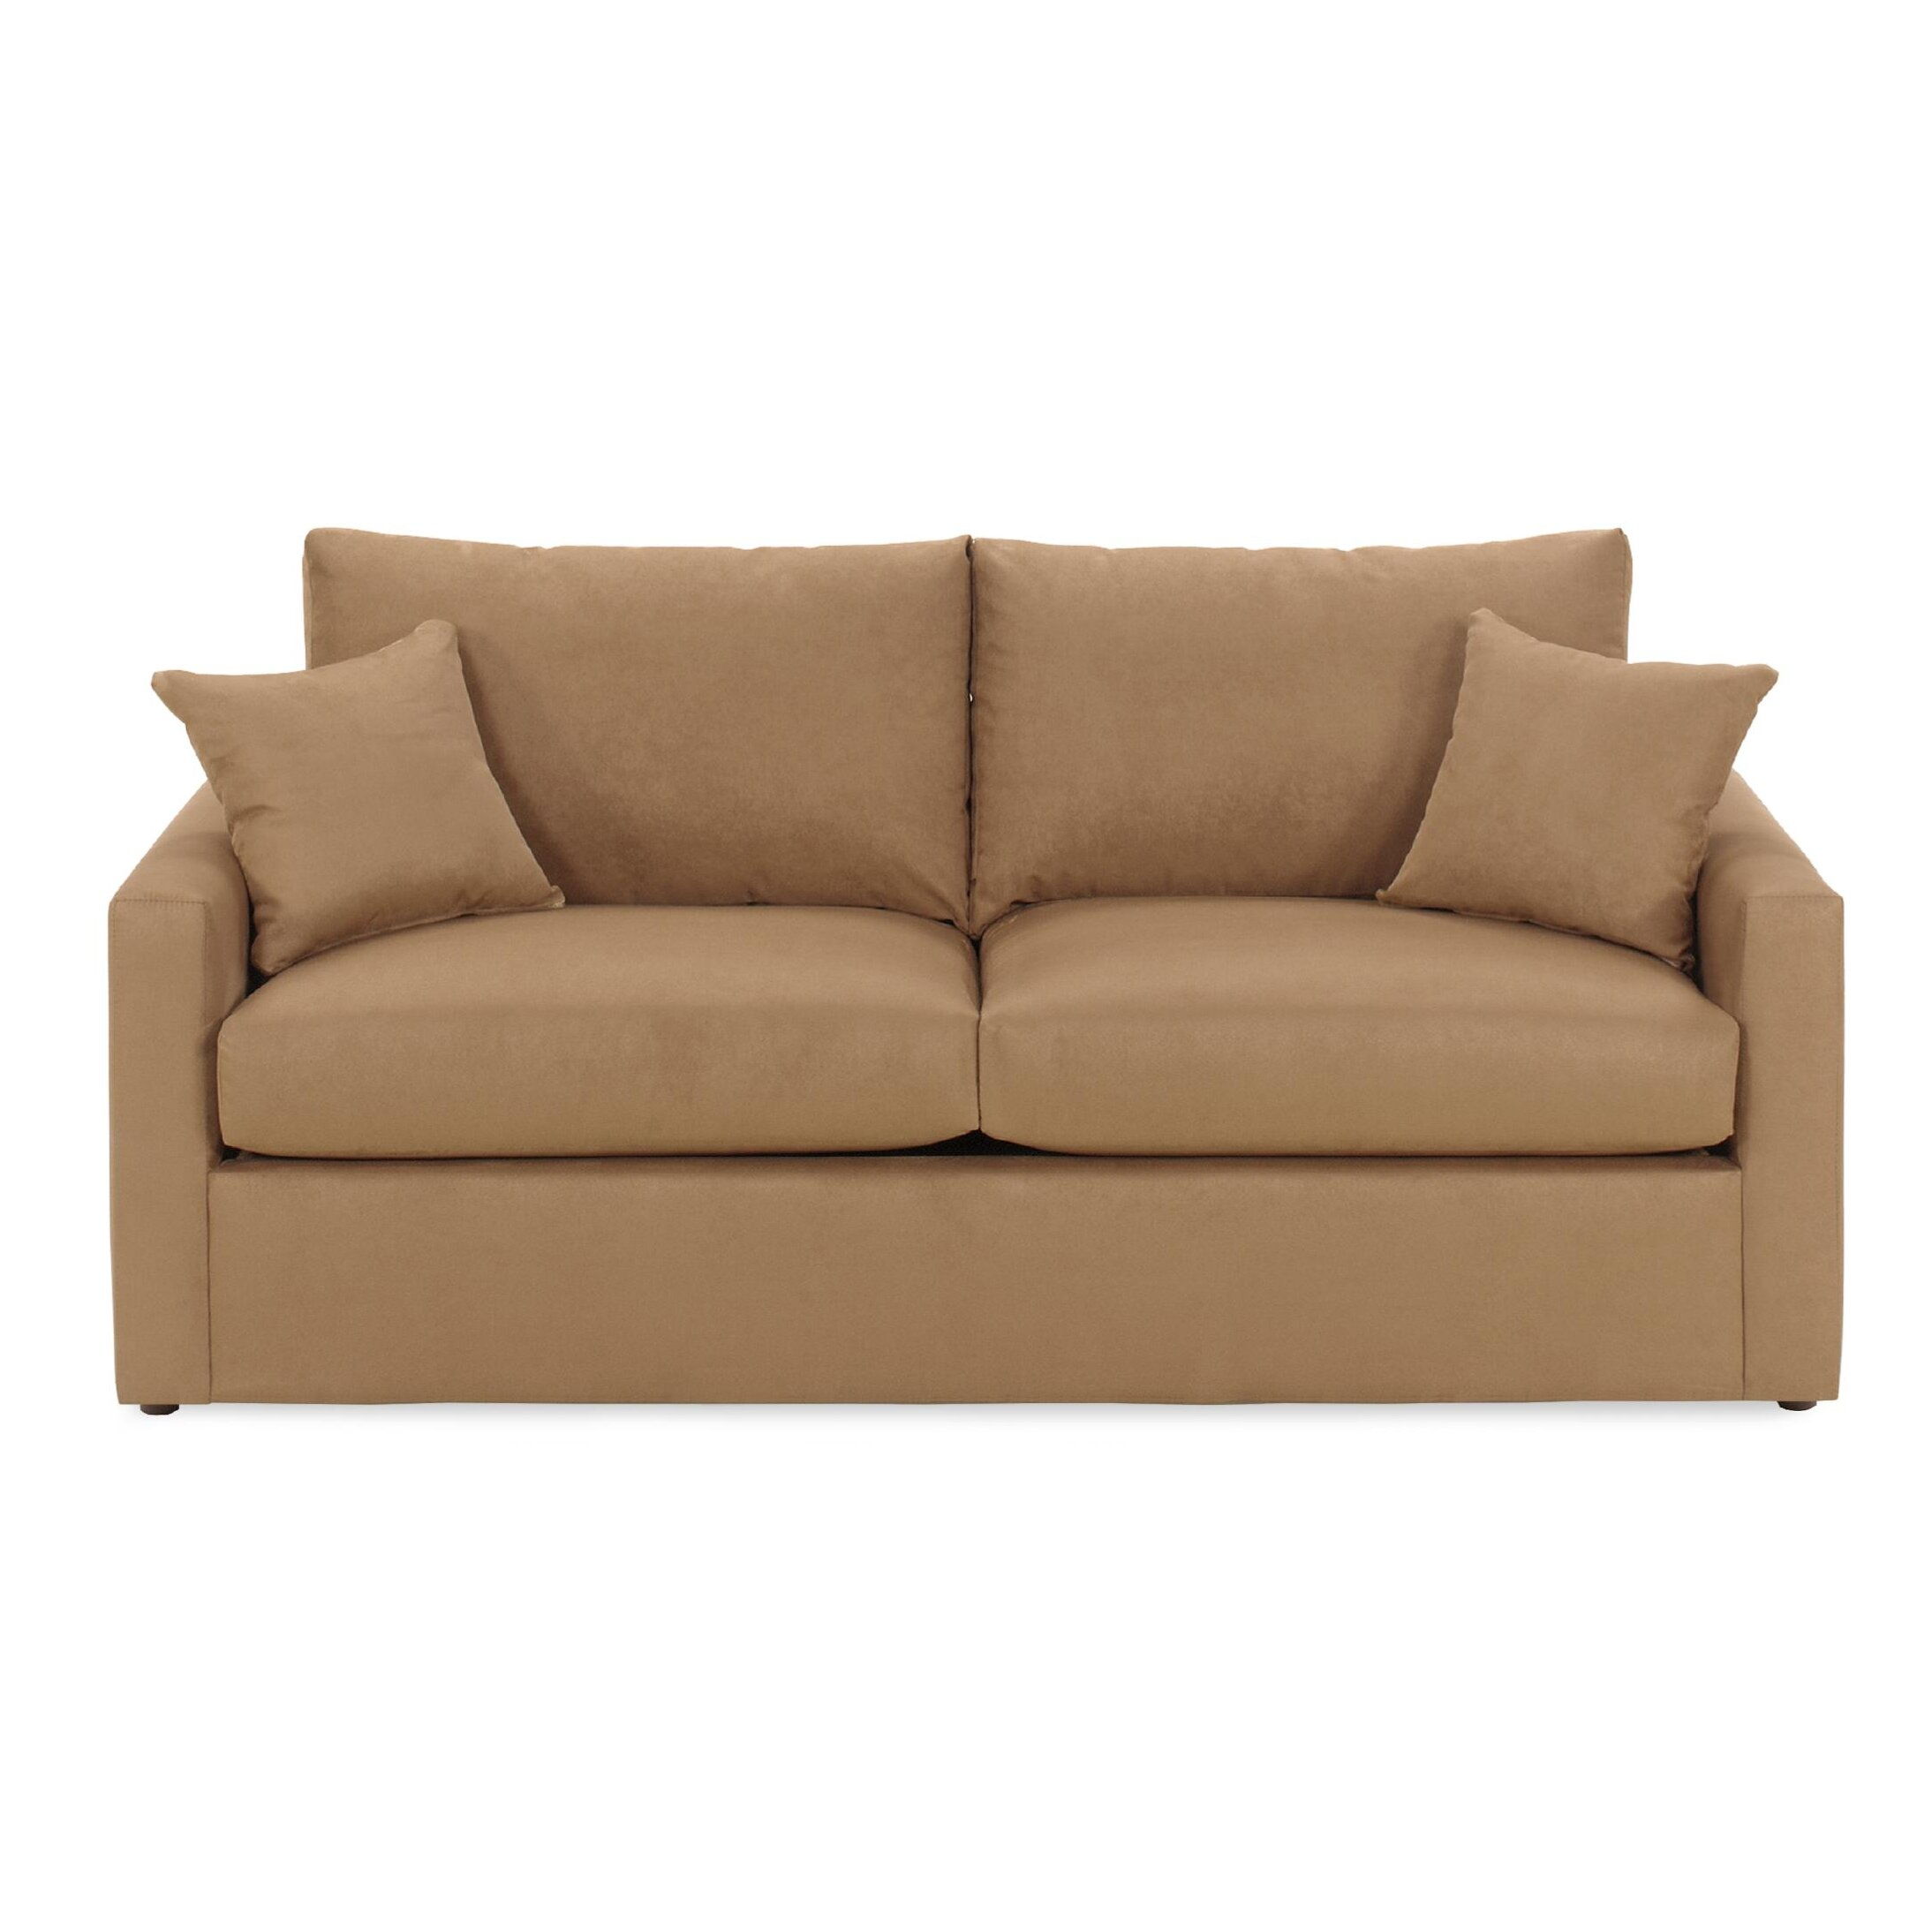 brayden studio ardencroft sleeper sofa reviews wayfair